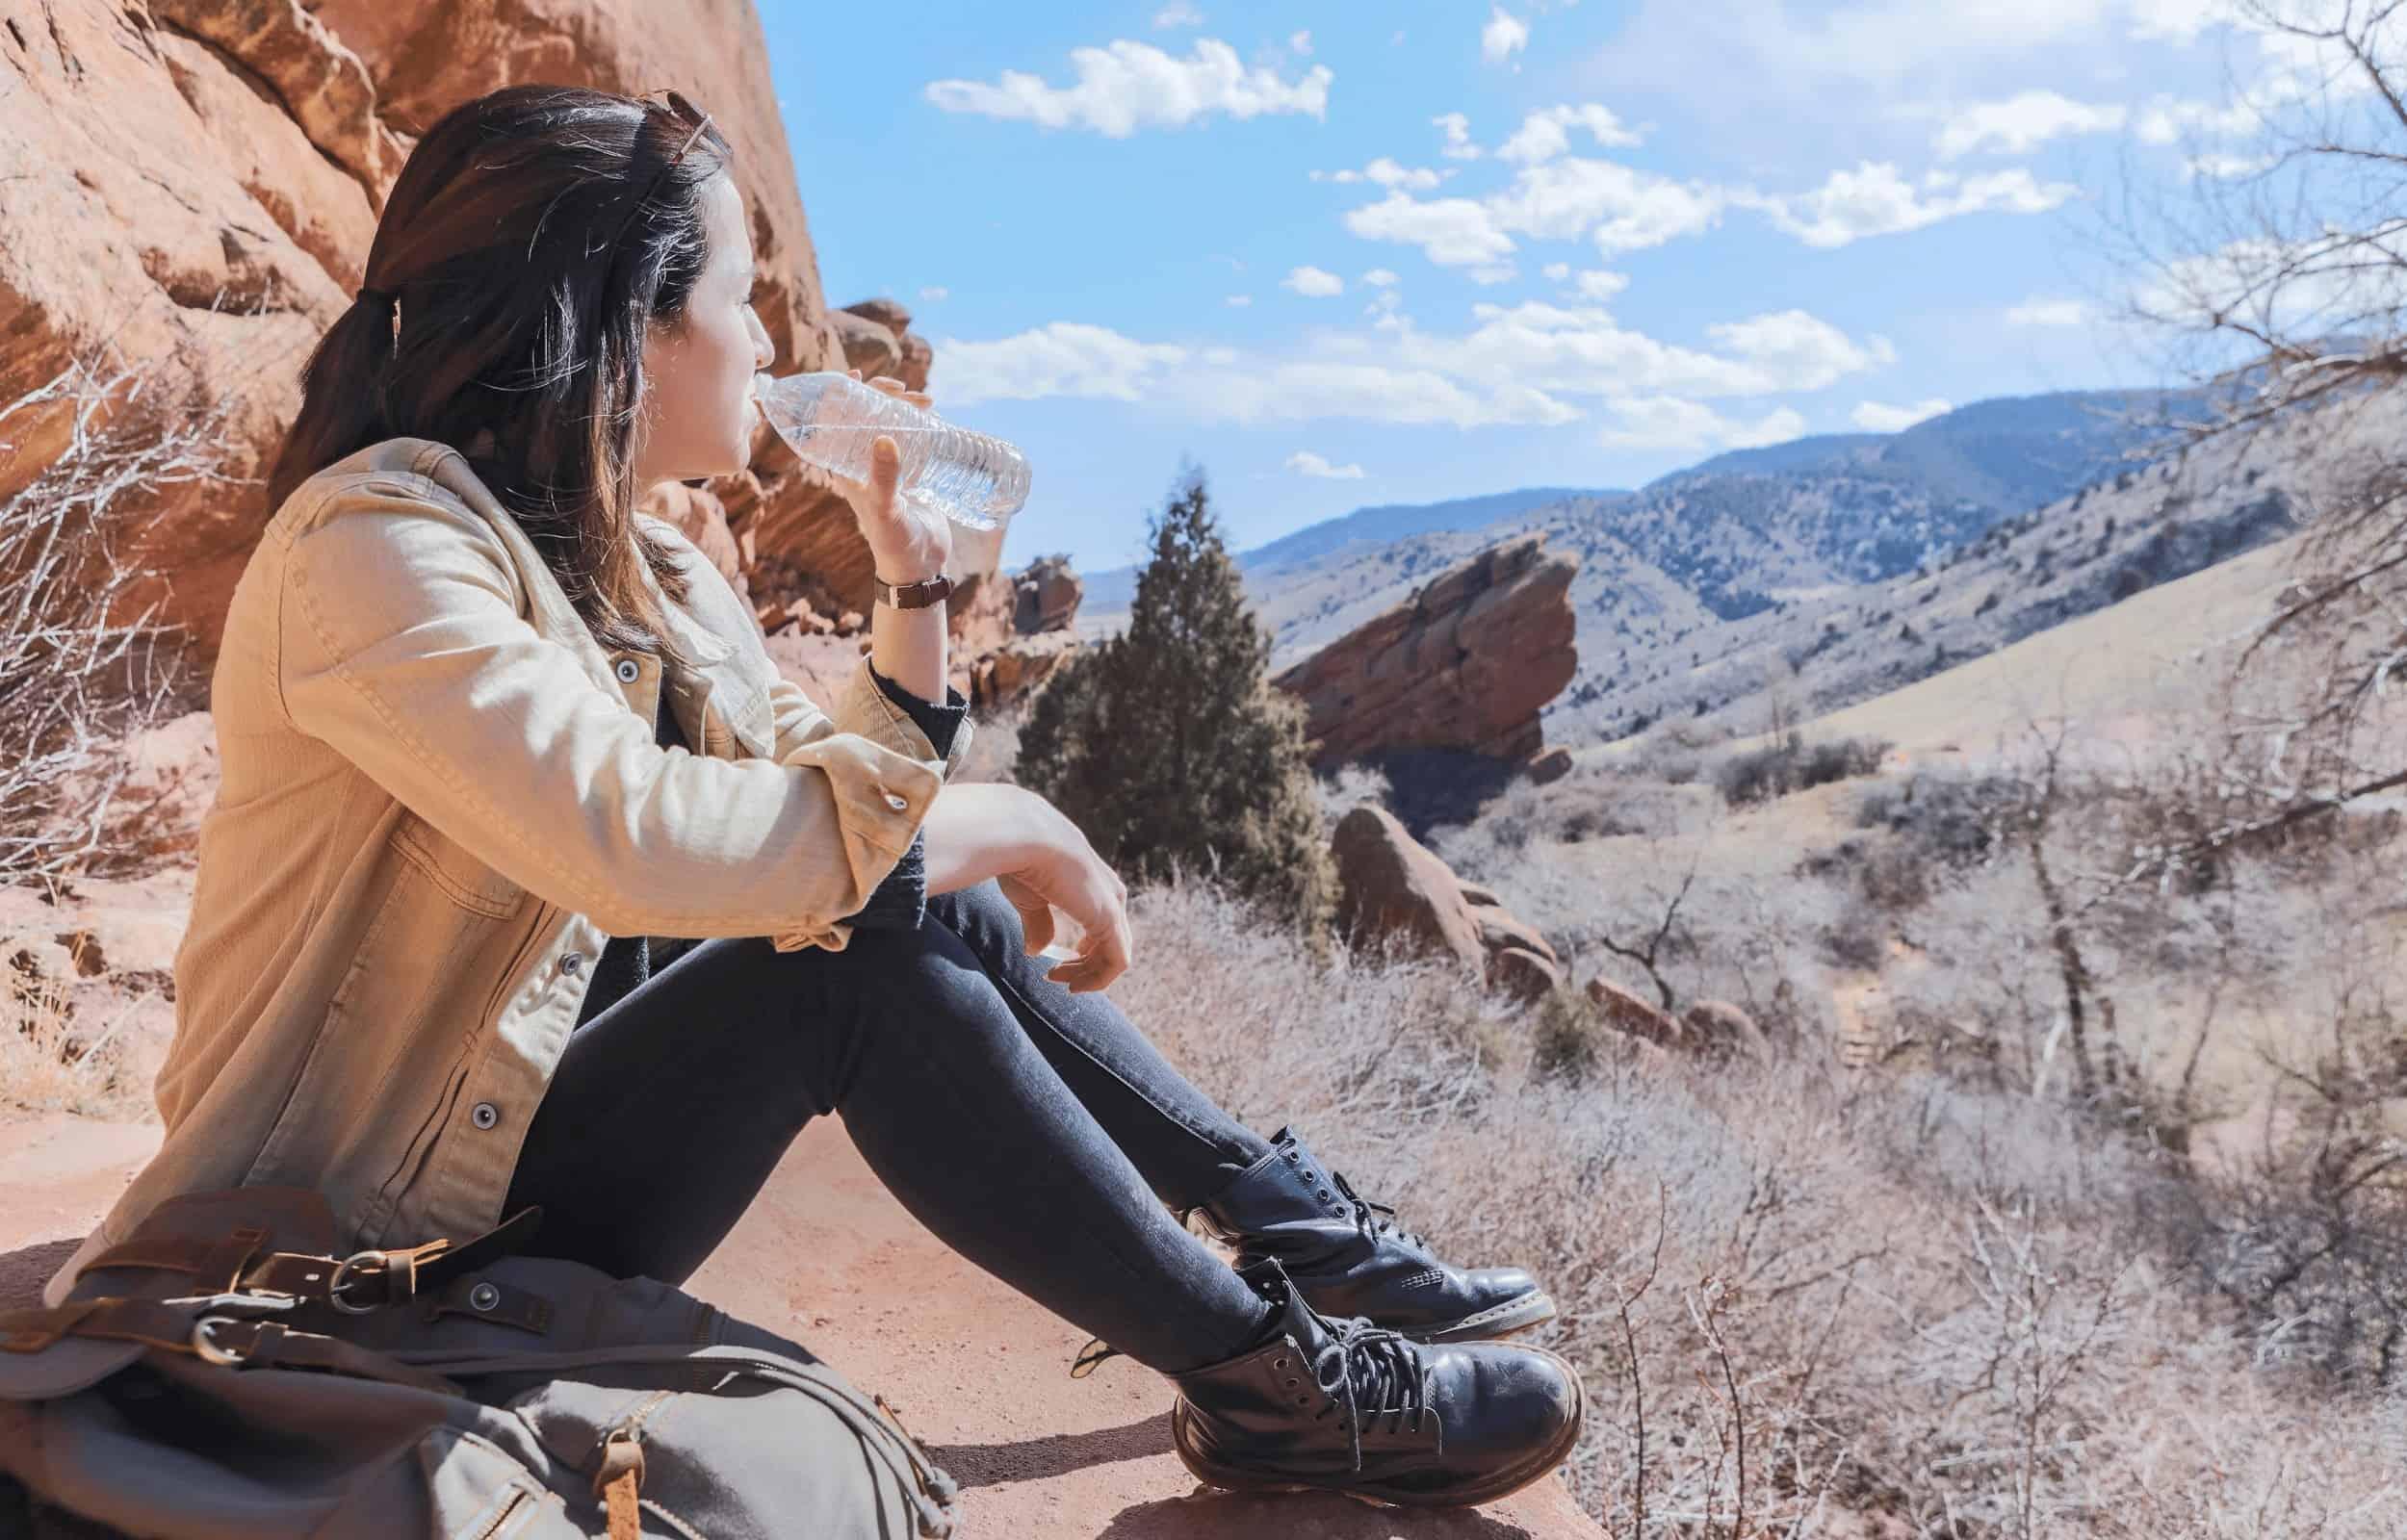 Girl hiking drinking water